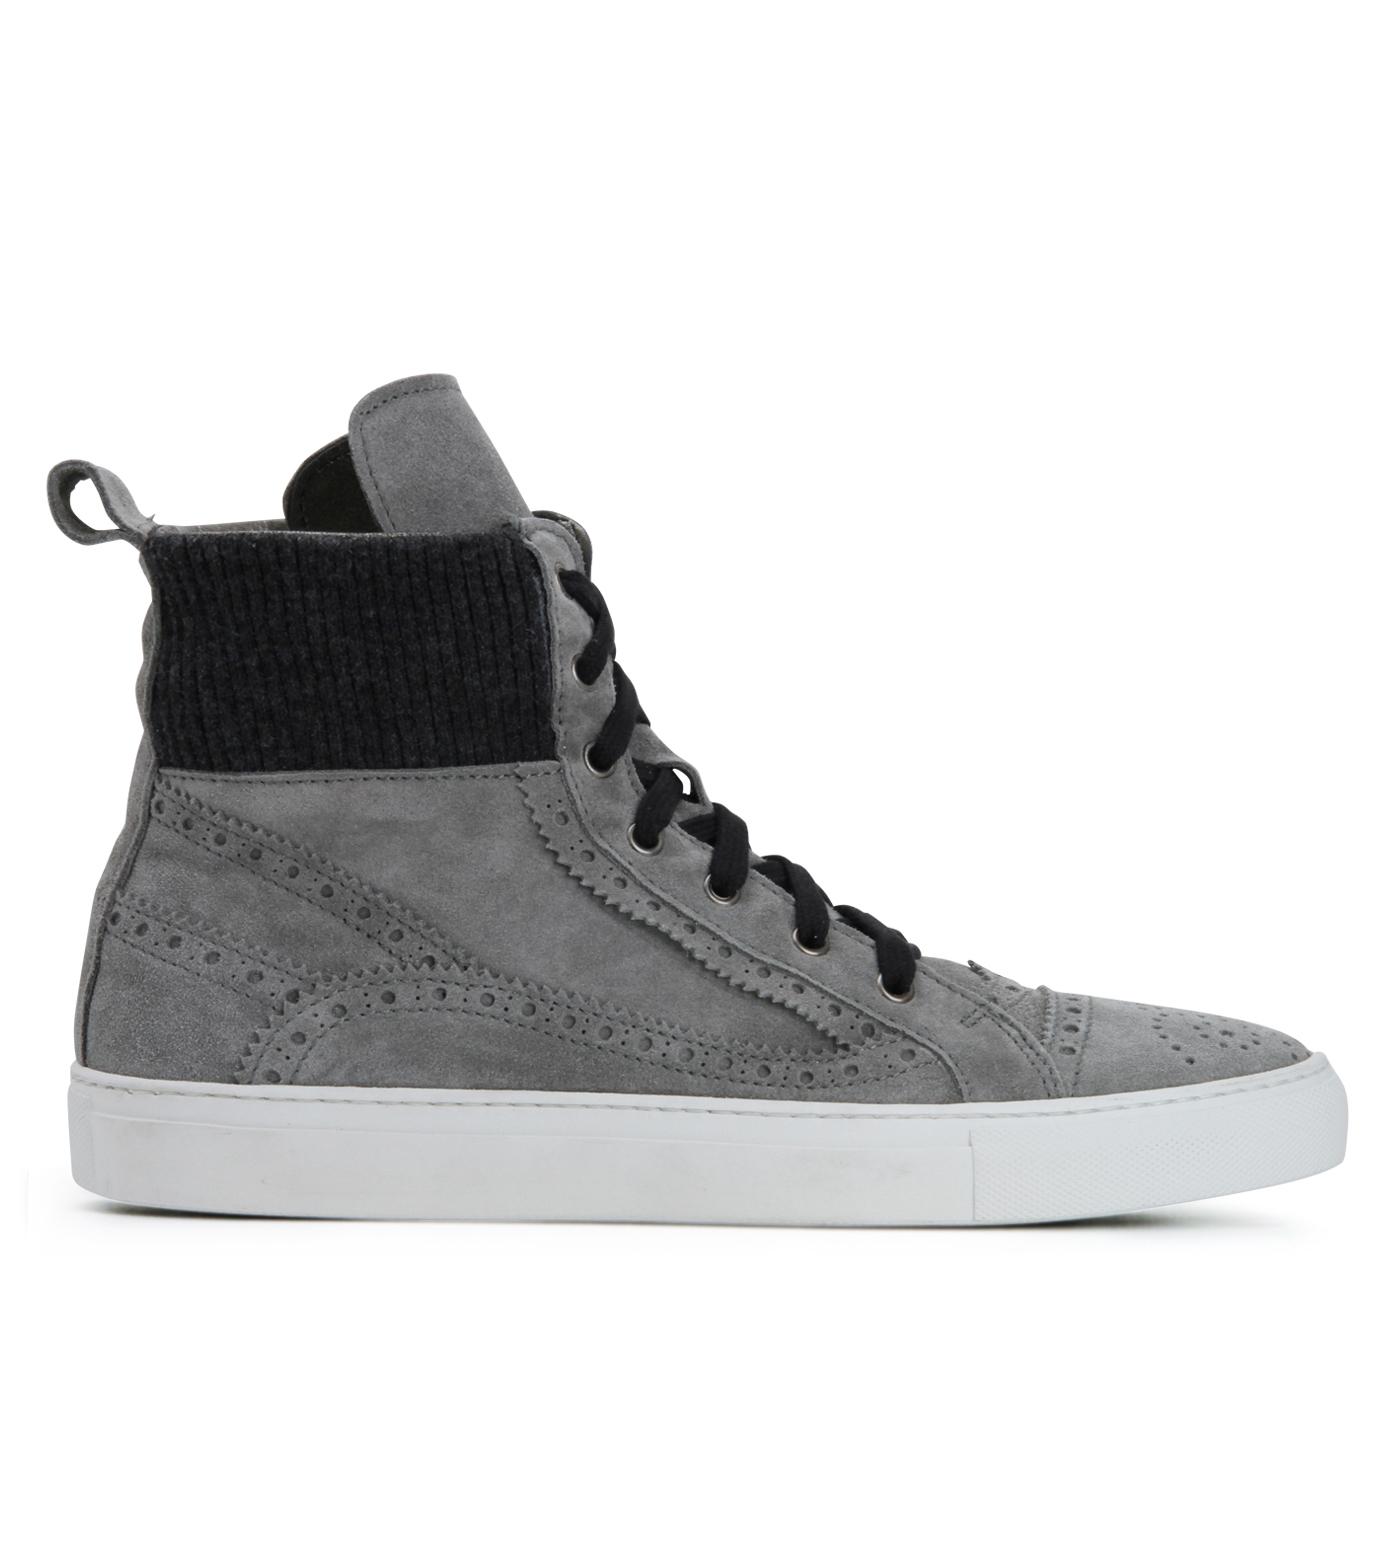 Les Homme(レゾム)のKnit Sneaker-LIGHT GRAY-LH1212-1107 拡大詳細画像1